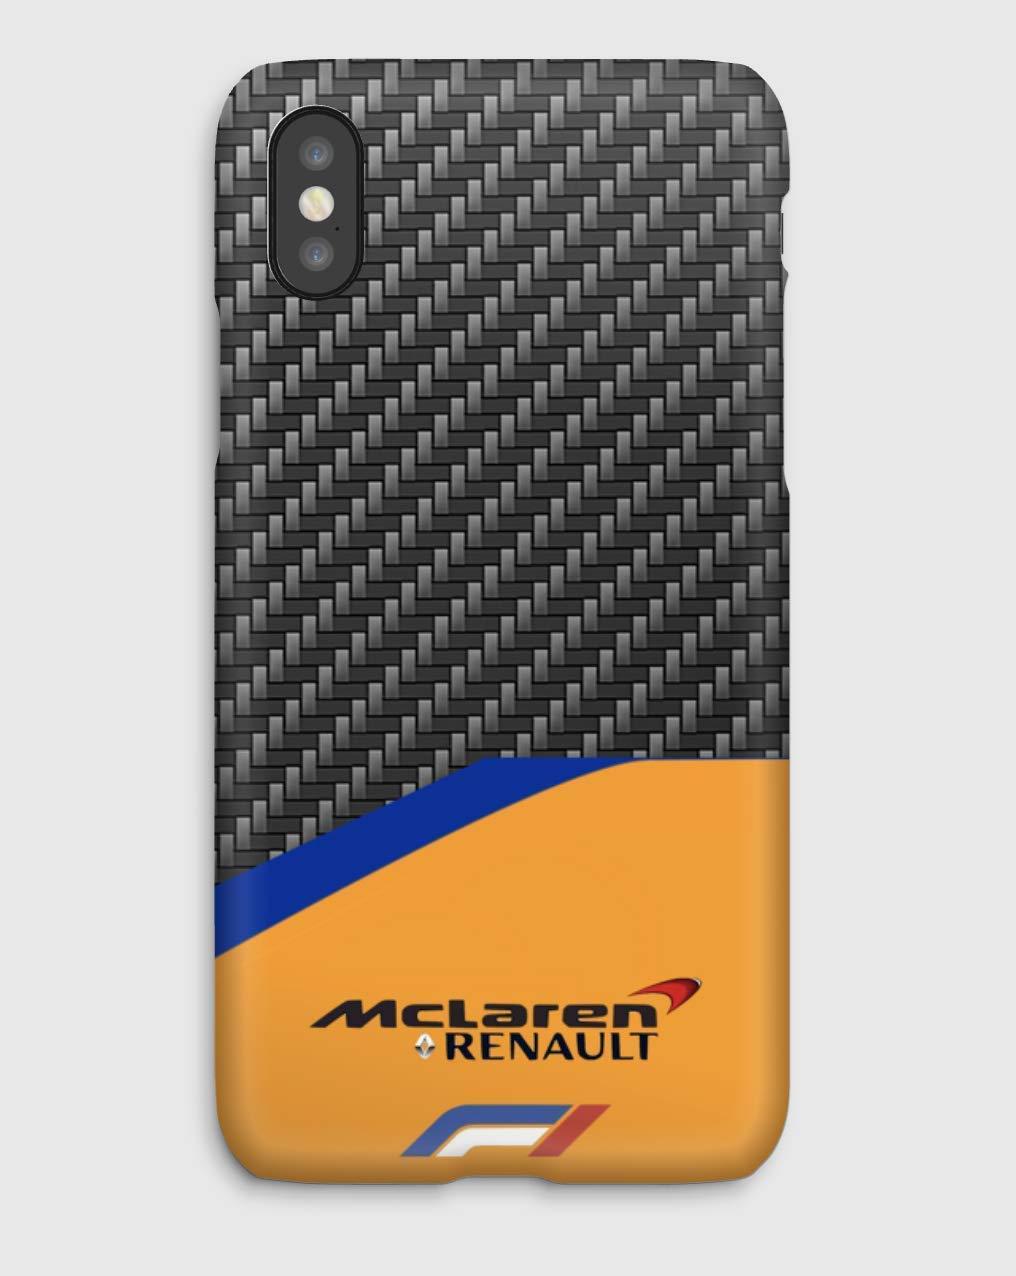 F1 carbon Mc Laren Funda para el iPhone XS, XS Max, XR, X, 8, 8+, 7, 7+, 6S, 6, 6S+, 6+, 5C, 5, 5S, 5SE, 4S, 4,